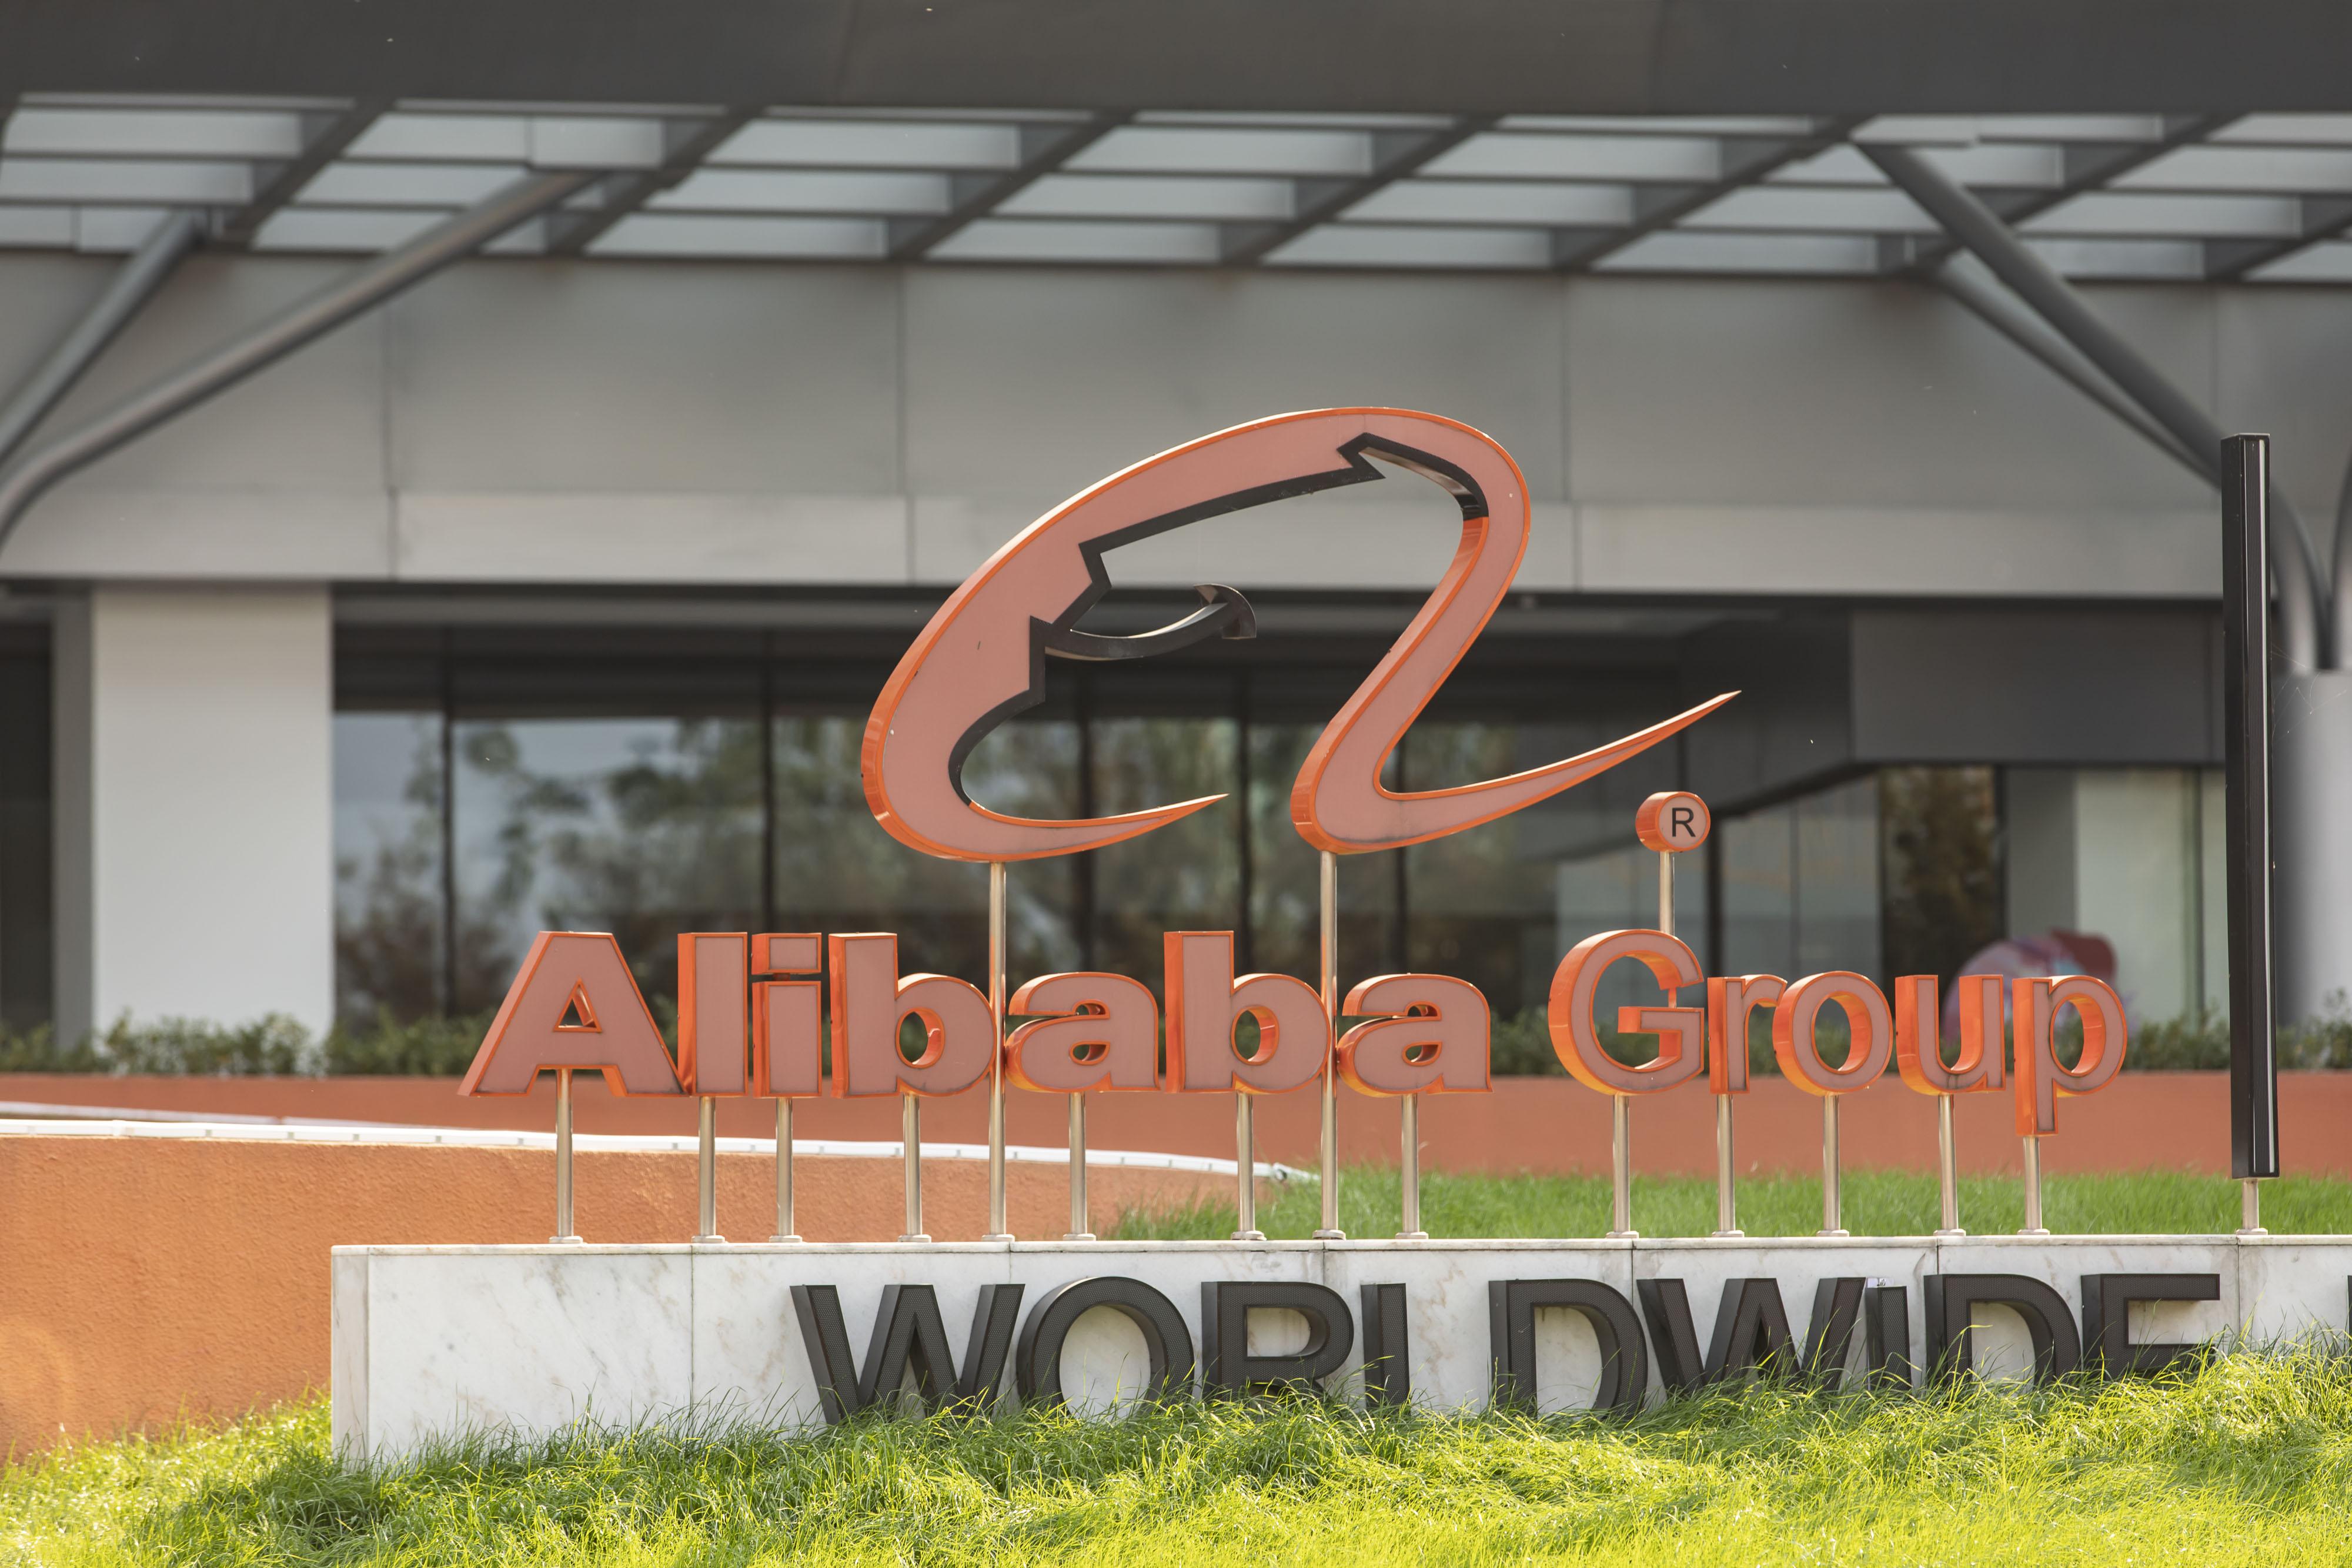 The Alibaba Group Holding Ltd. headquarters in Hangzhou, China.